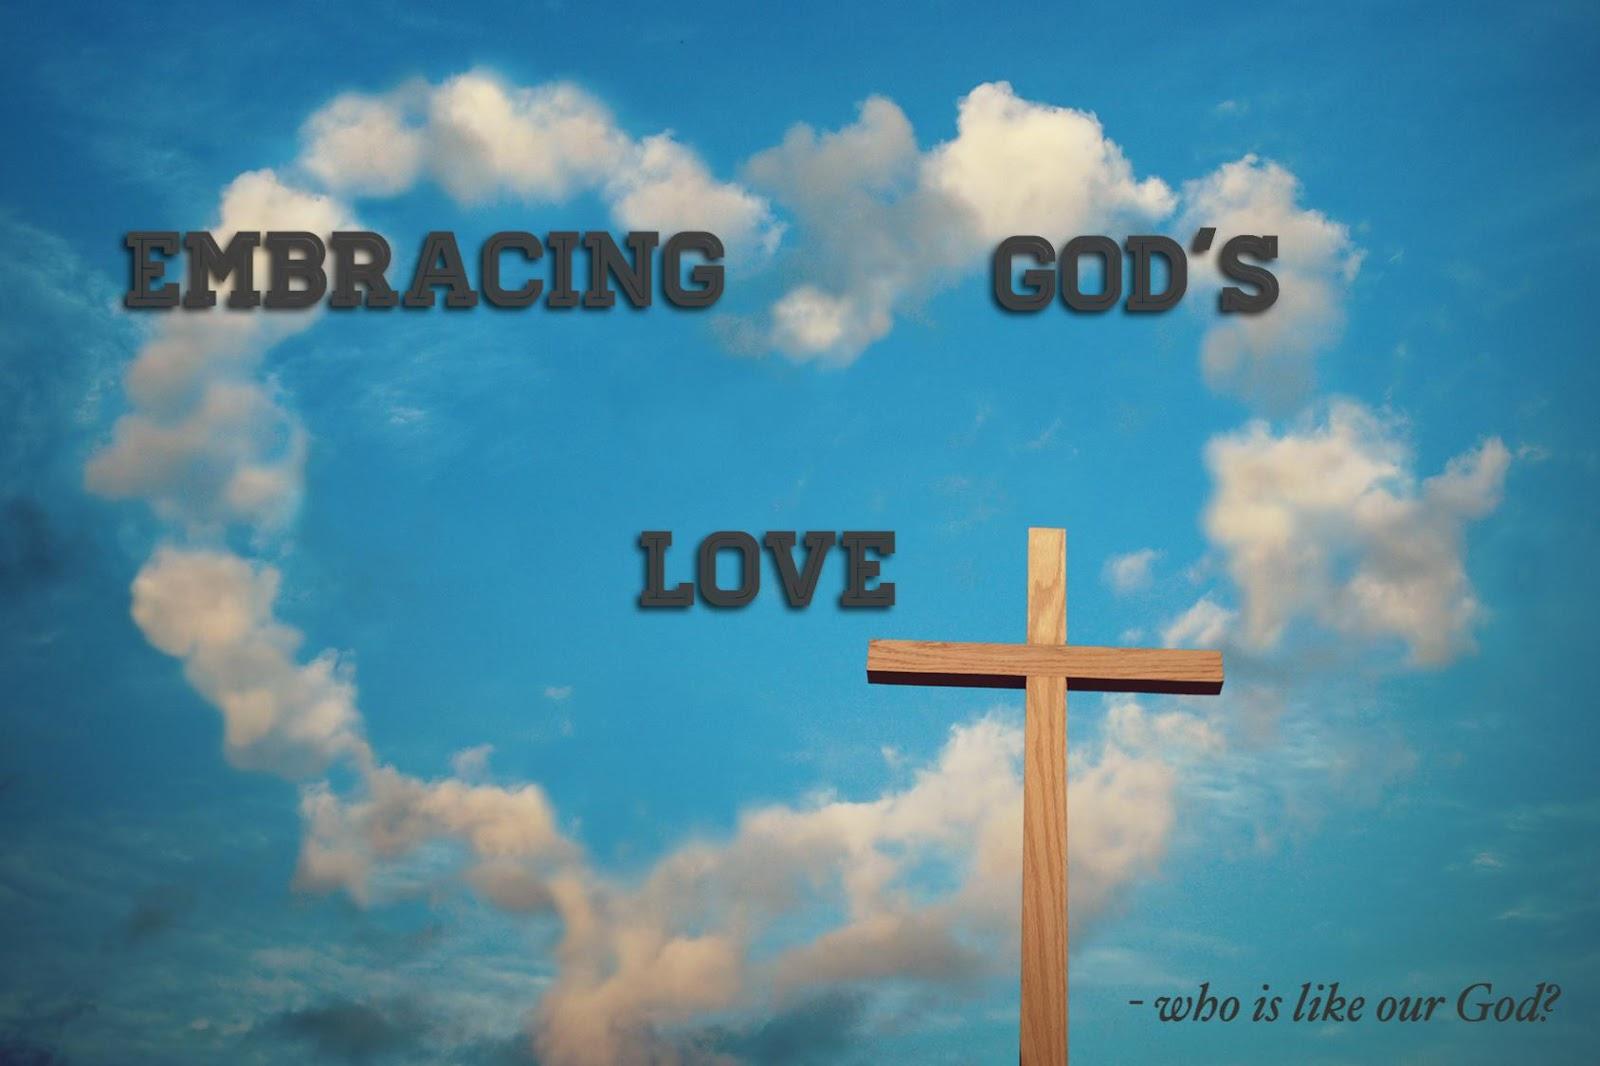 Embracing God's love 2